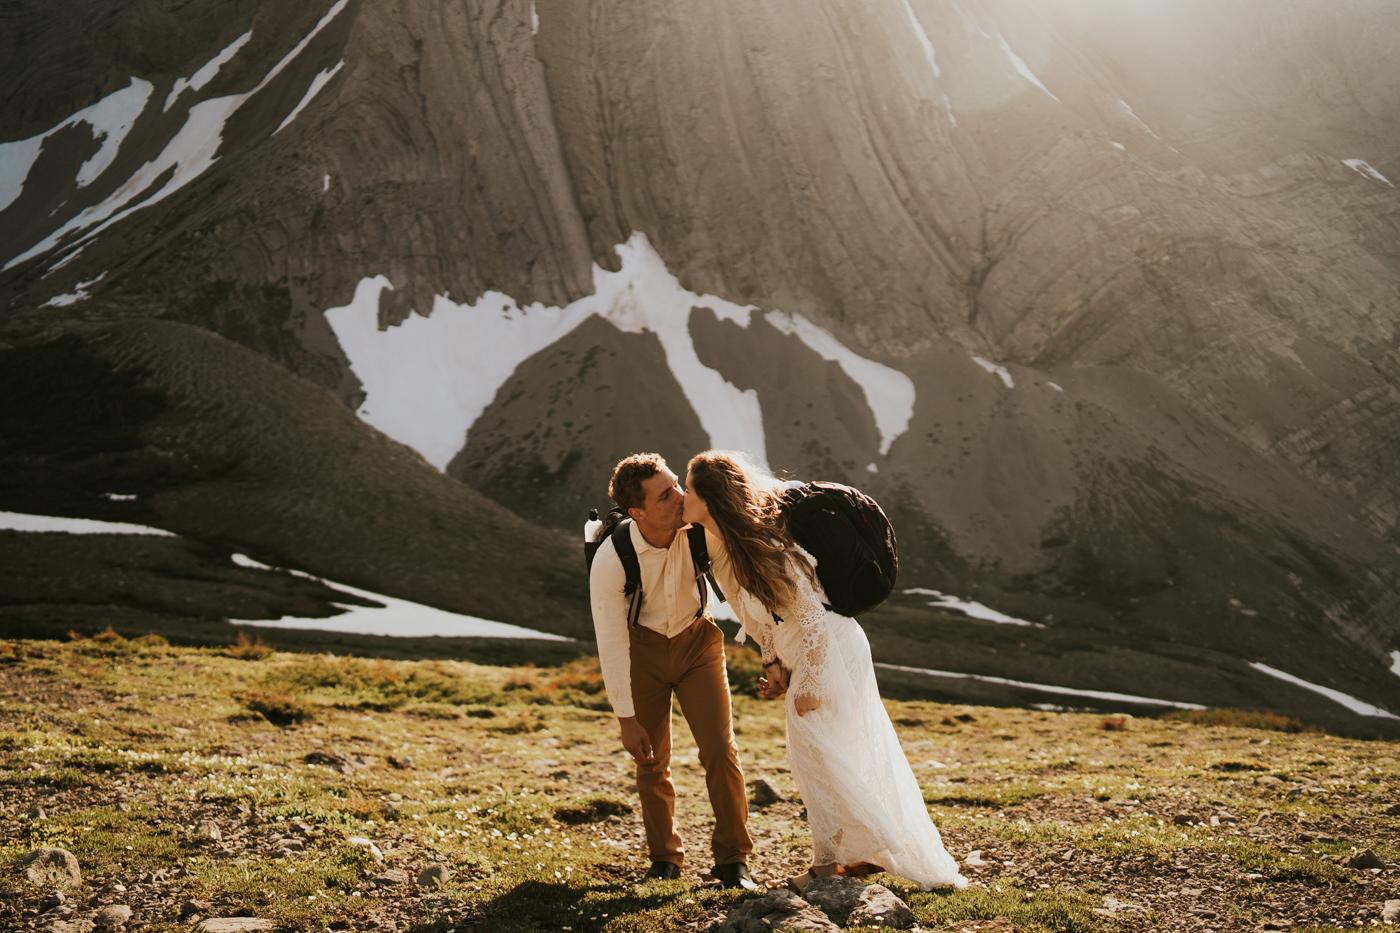 tyraephotography_photographer_wedding_elopement_engagement_photography-08473.jpg